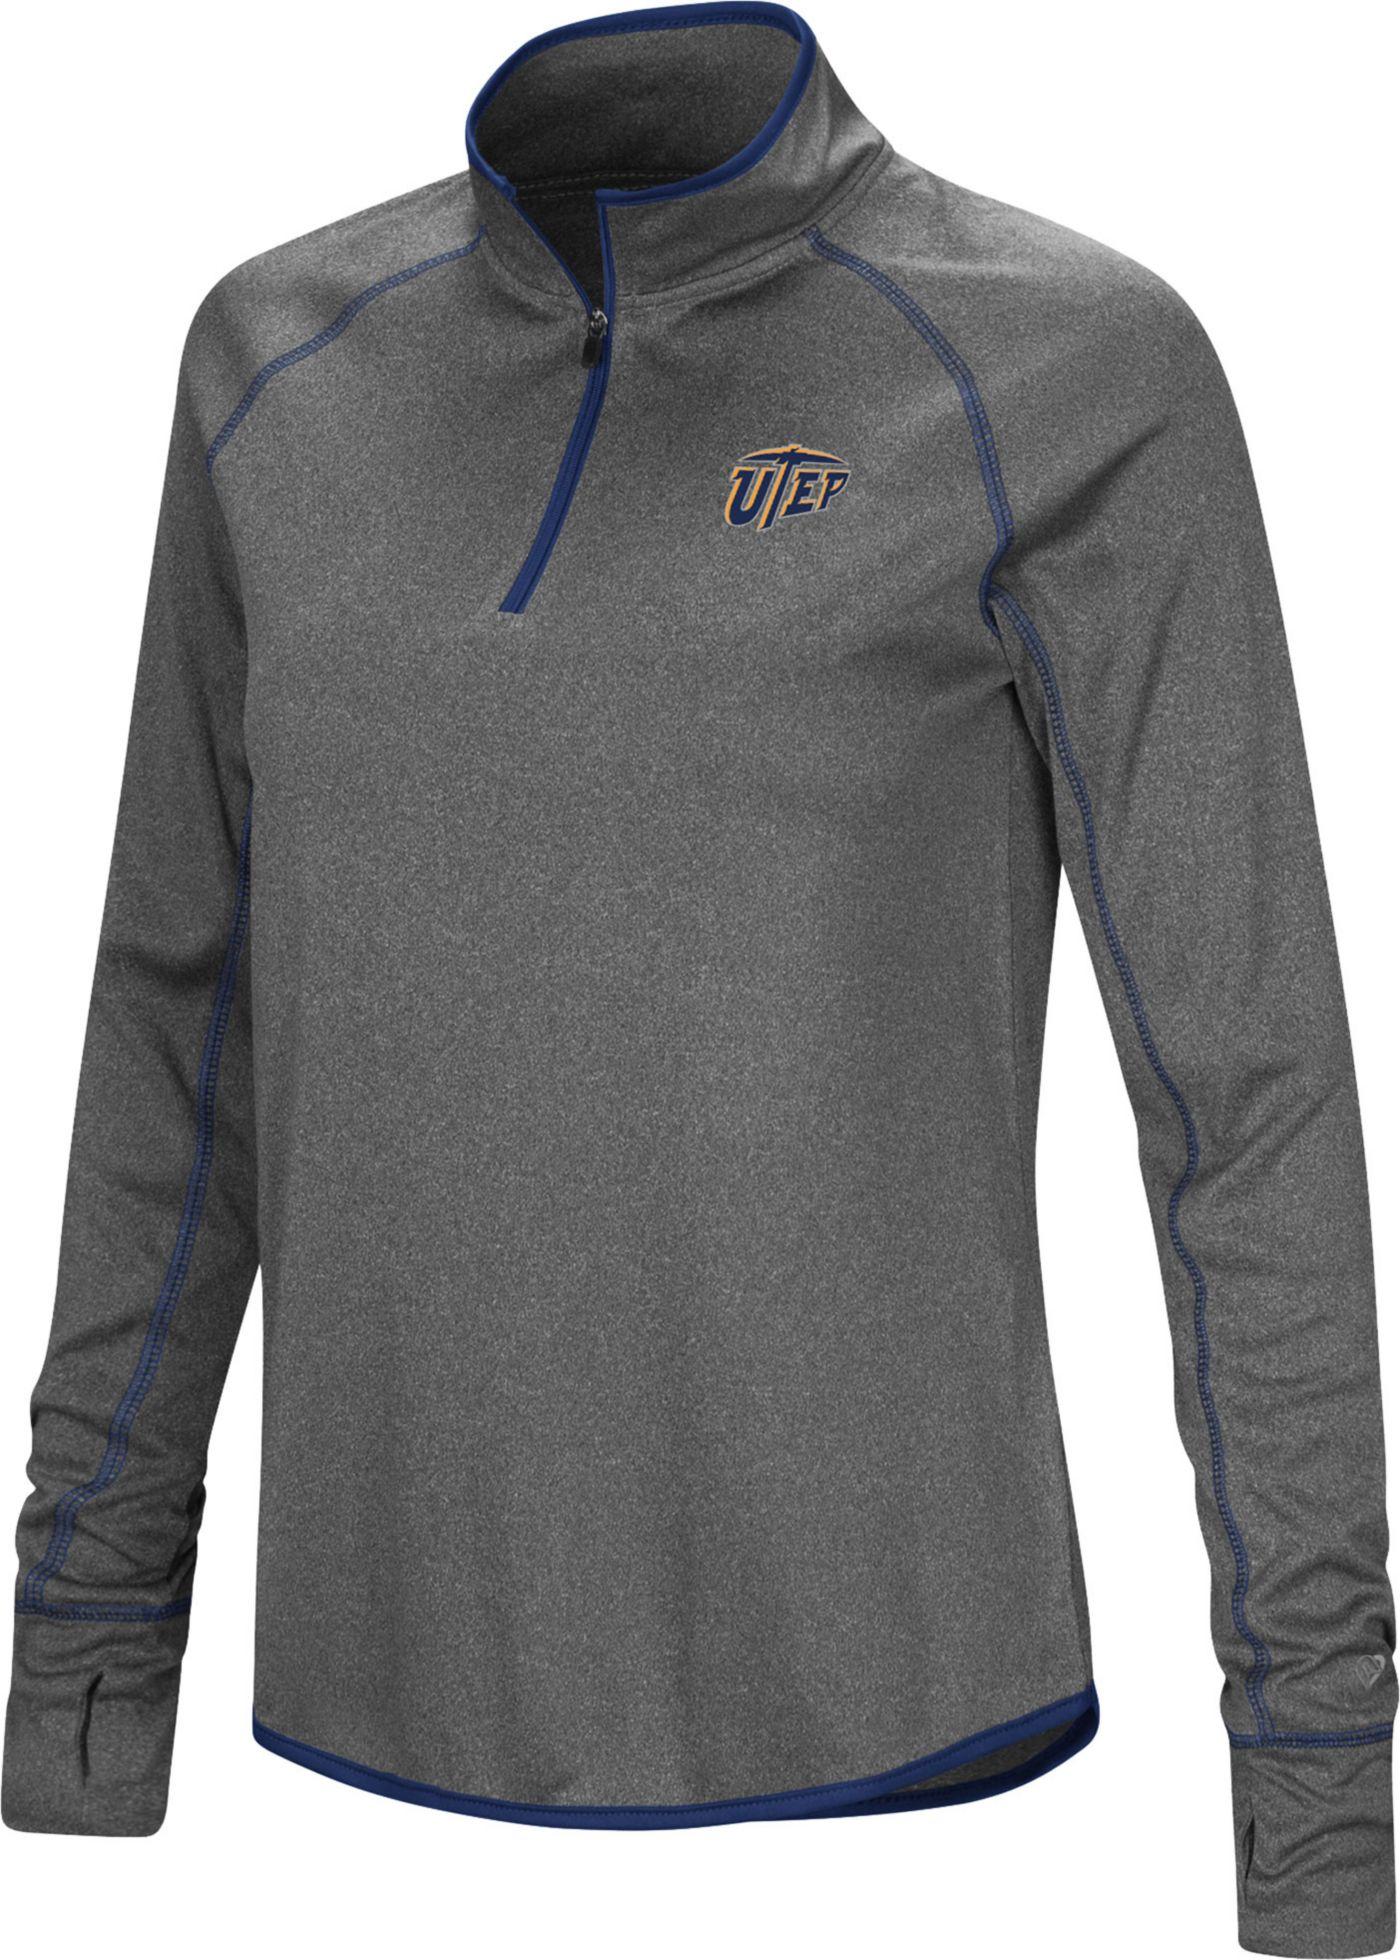 Colosseum Women's UTEP Miners Grey Stingray Quarter-Zip Shirt